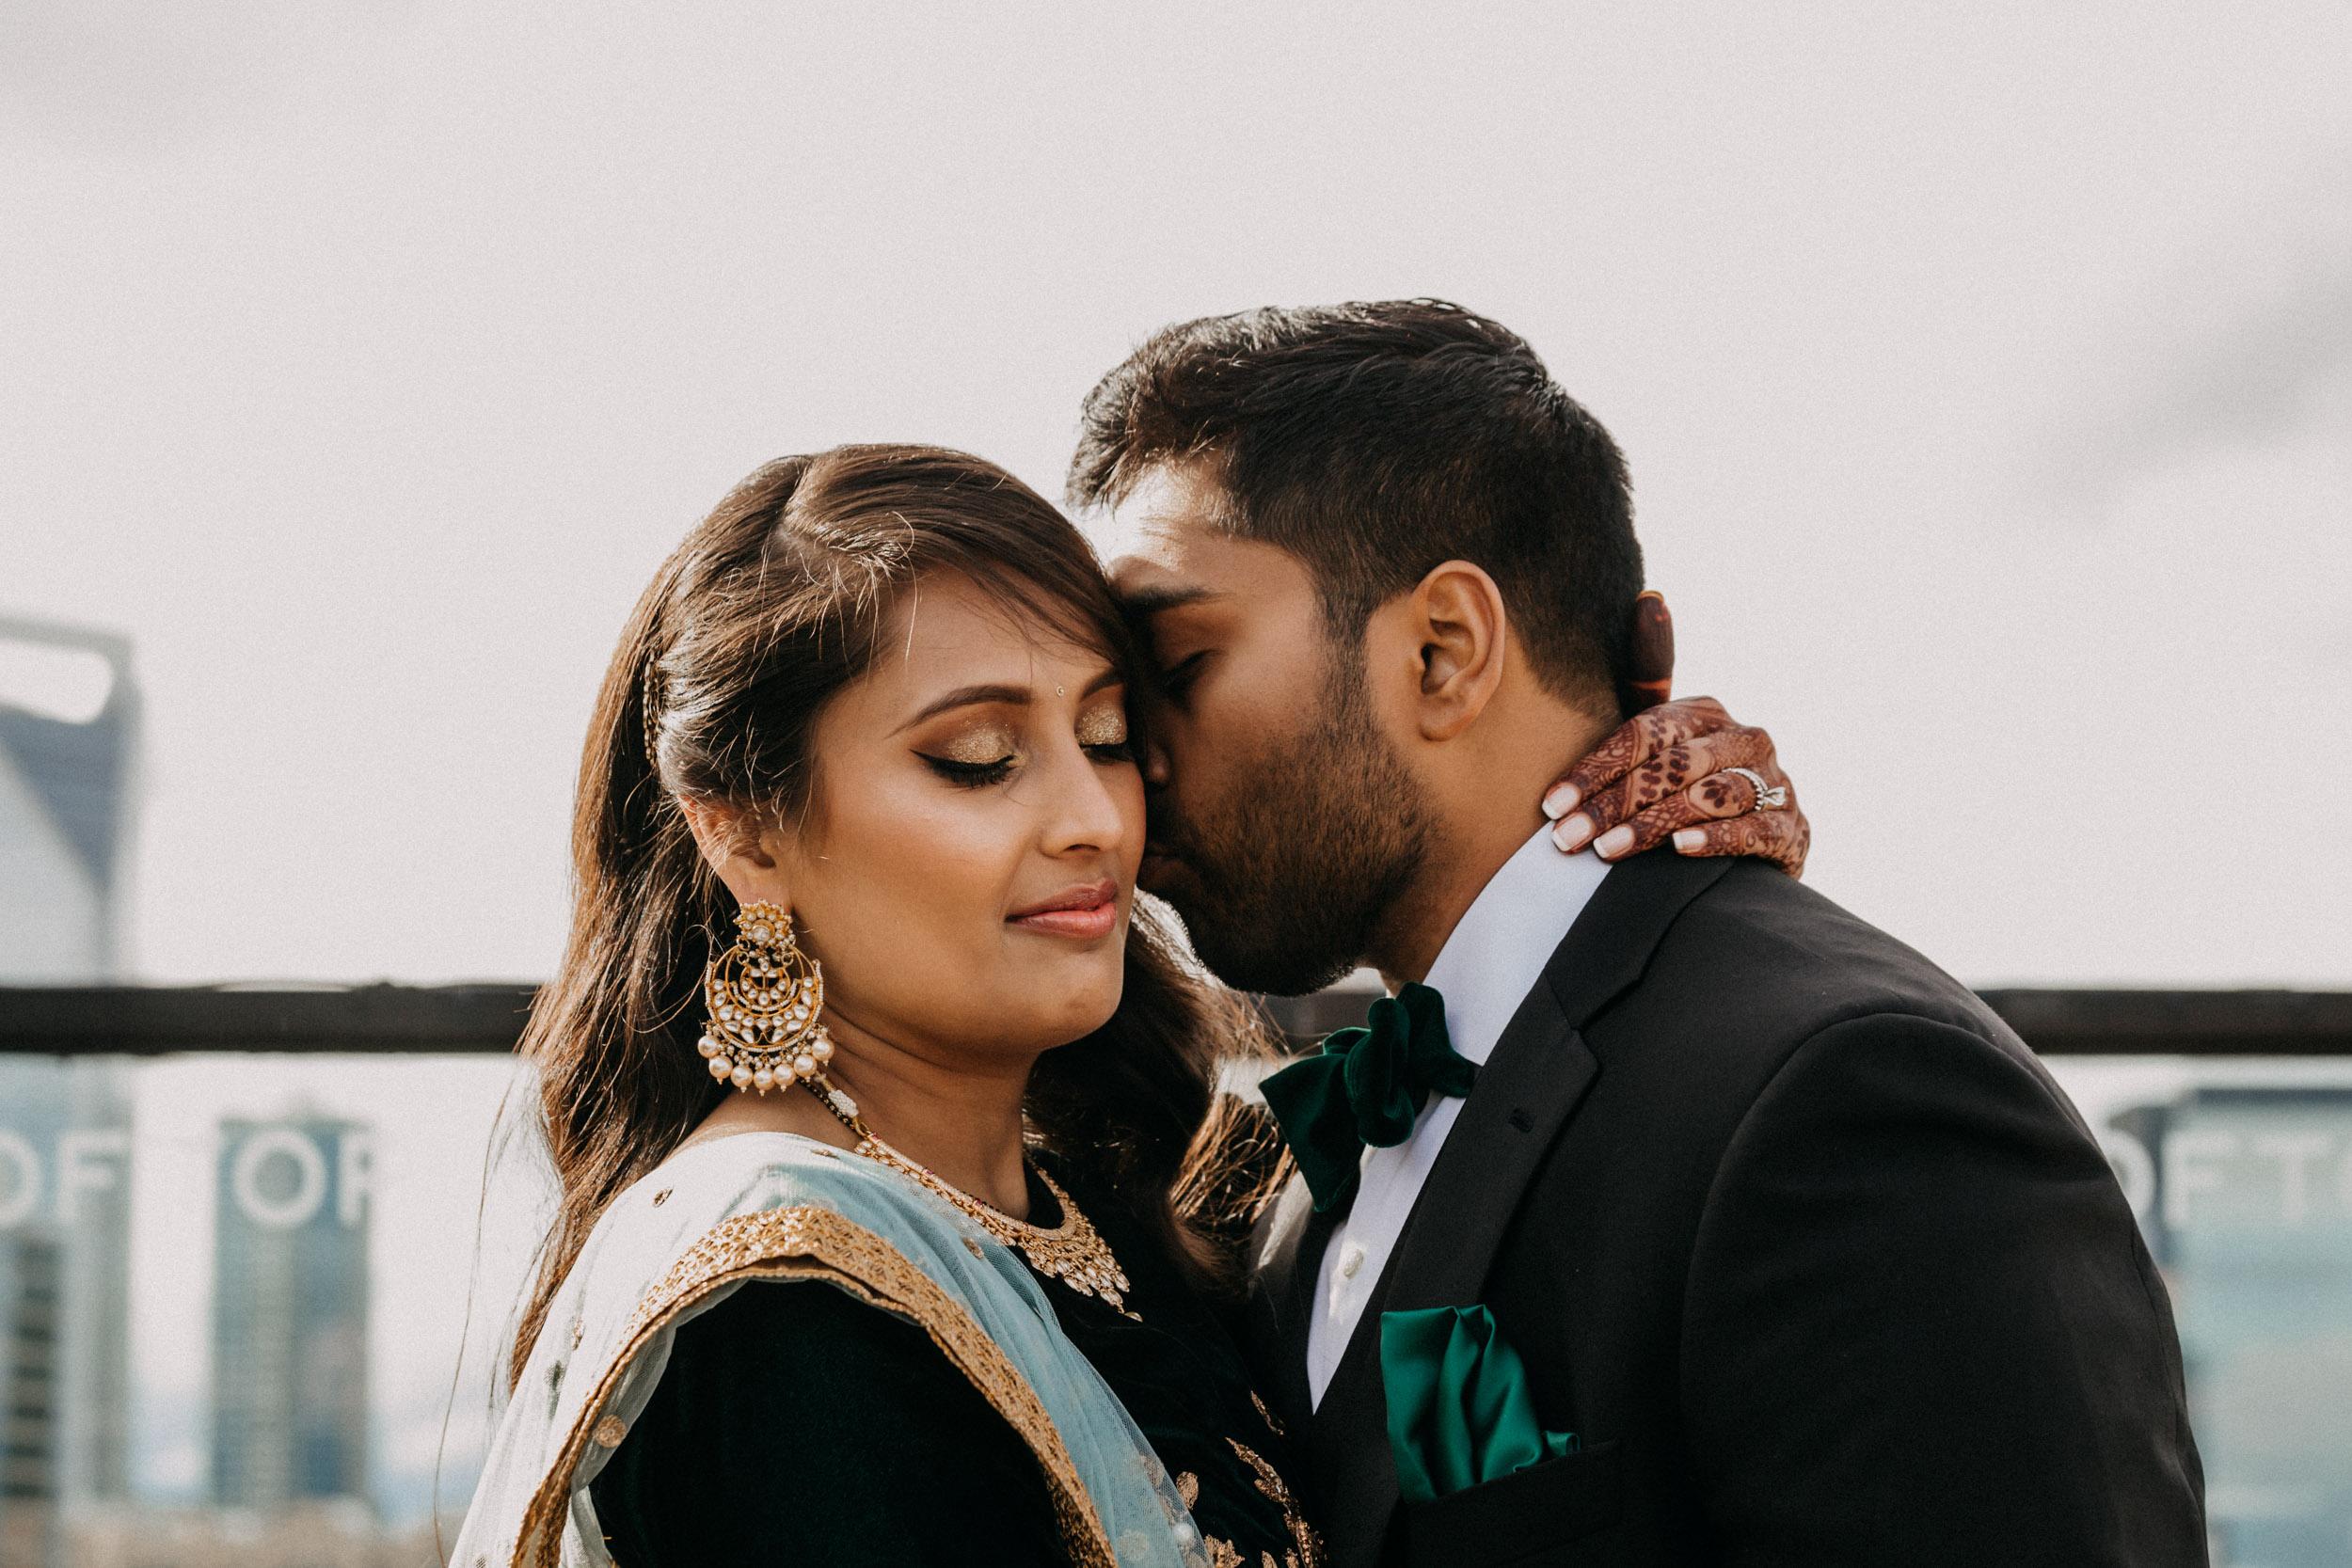 Hindu-wedding-charlotte-nc-yesha-vishal067.jpg